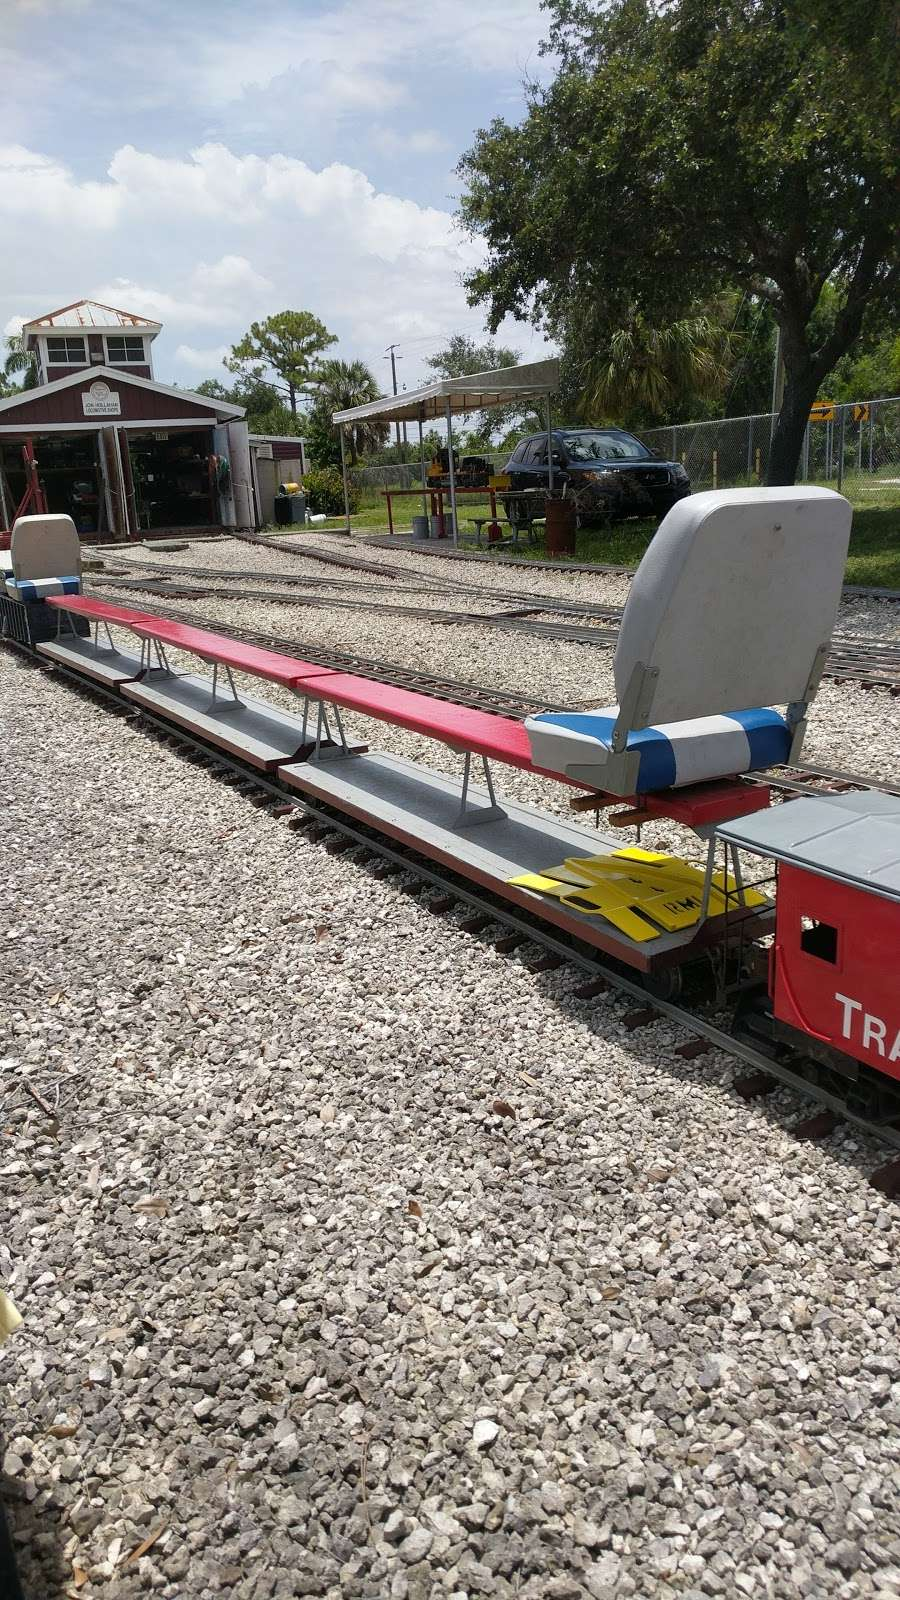 Tradewinds & Atlantic Railroad - museum  | Photo 5 of 10 | Address: Coconut Creek, FL 33073, USA | Phone: (954) 494-6877